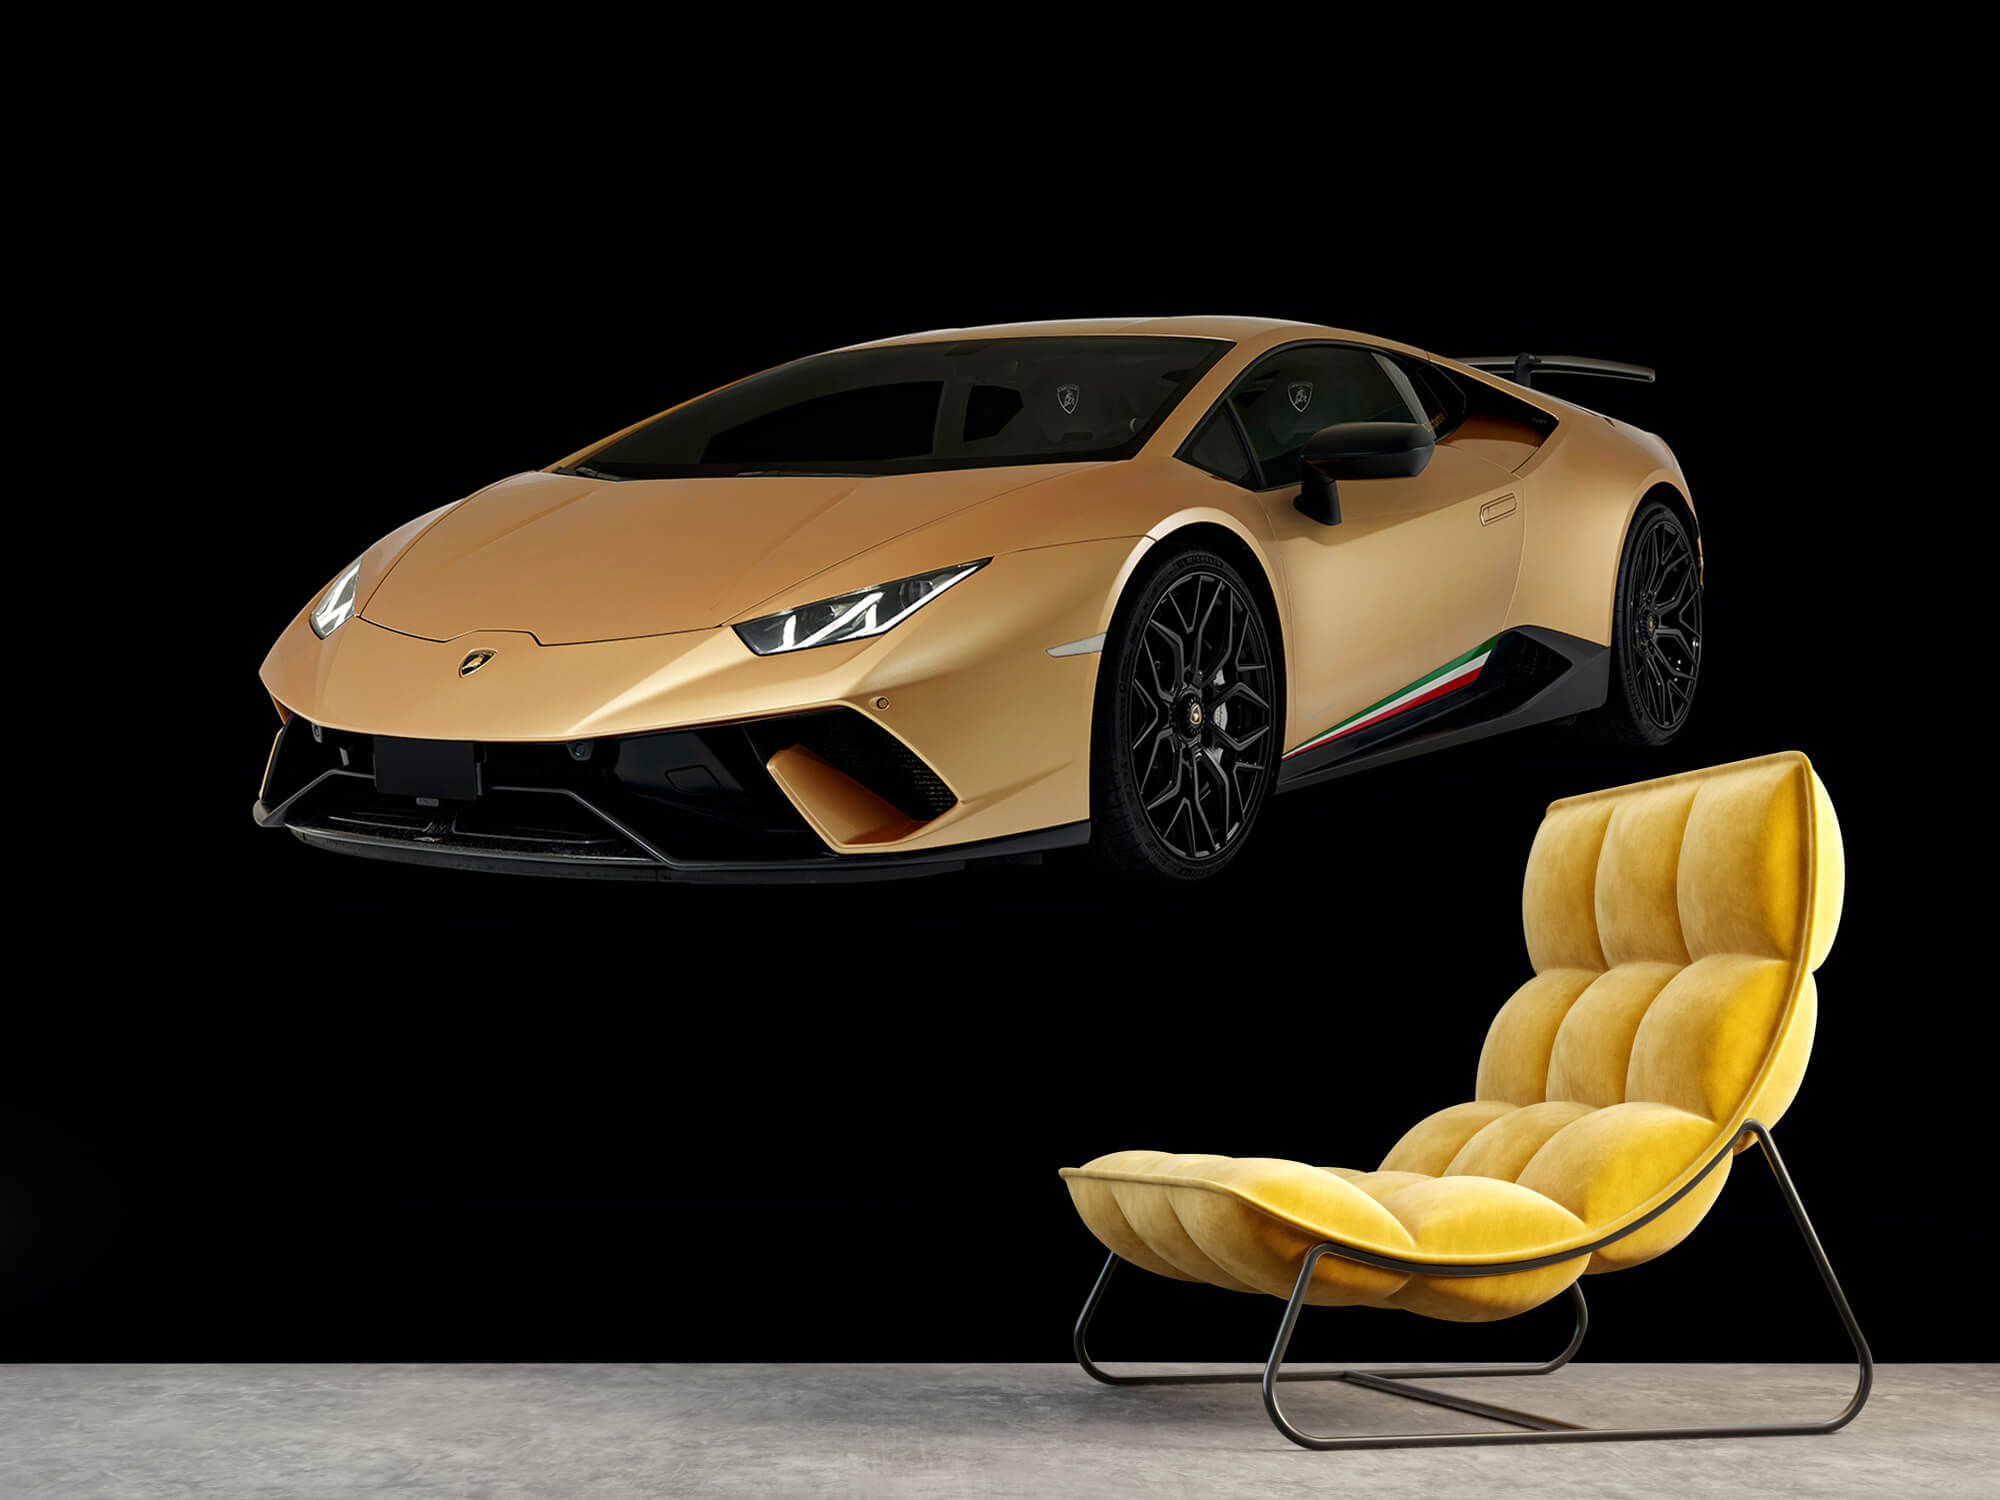 Wallpaper Lamborghini Huracán - Avant droit, noir 3